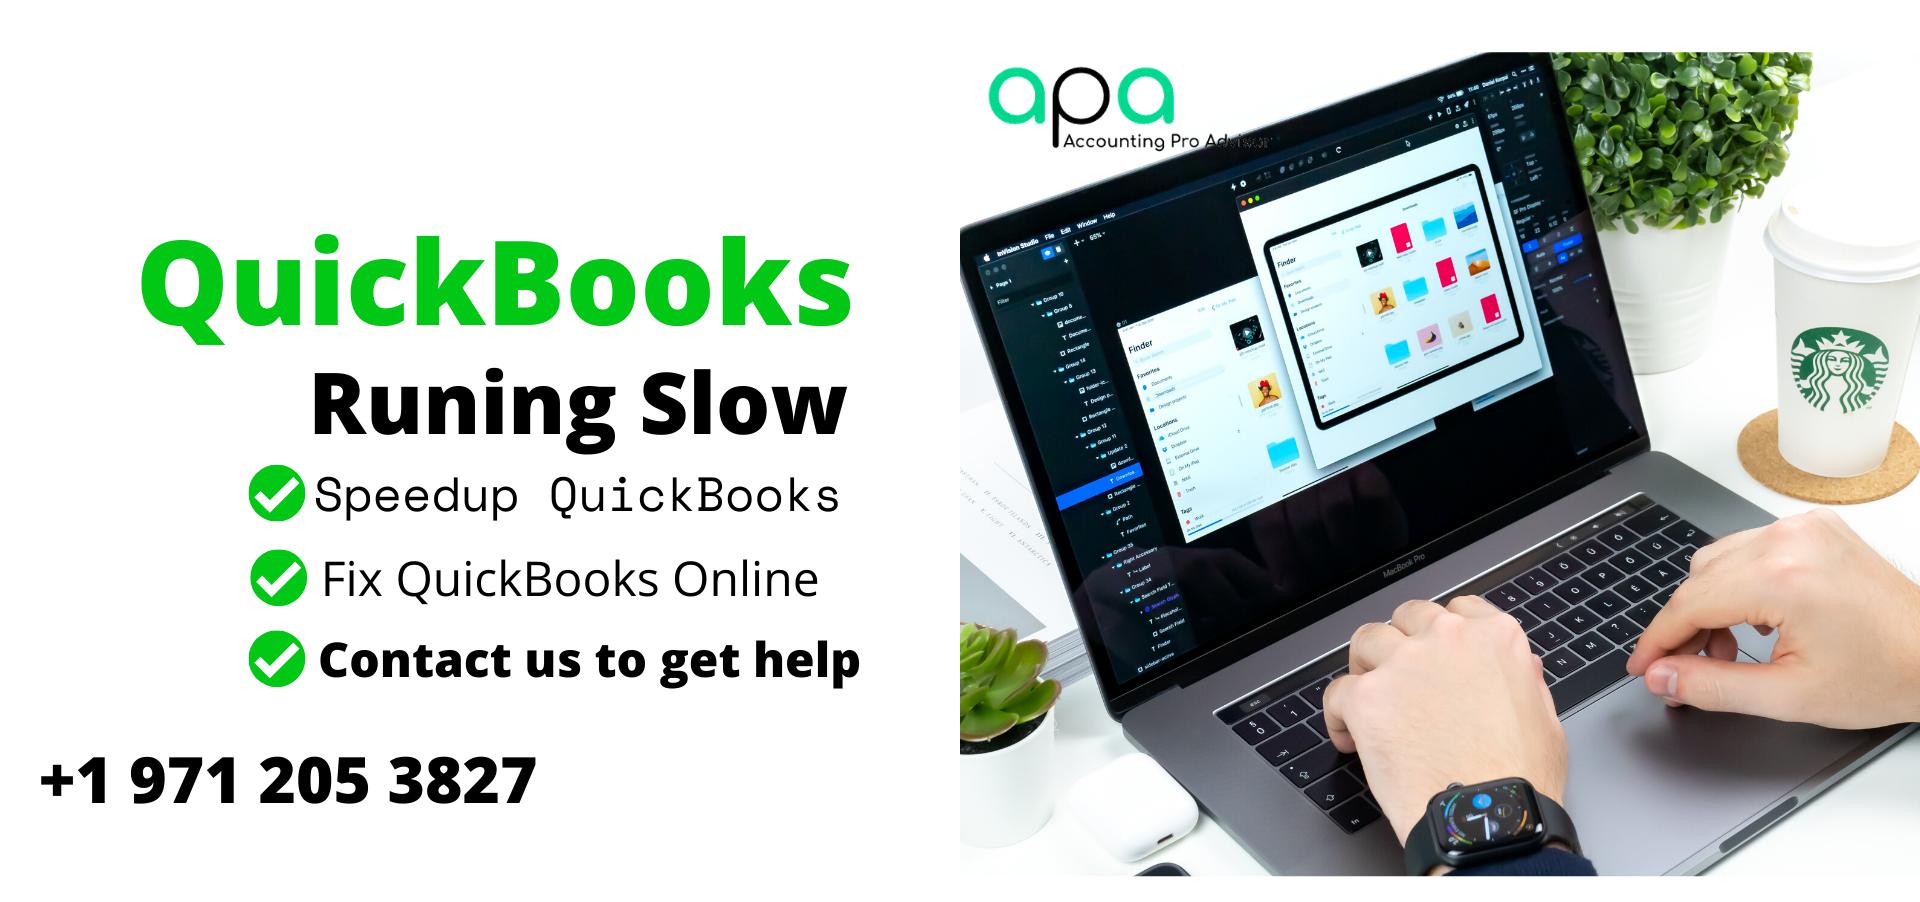 QuickBooks running slow